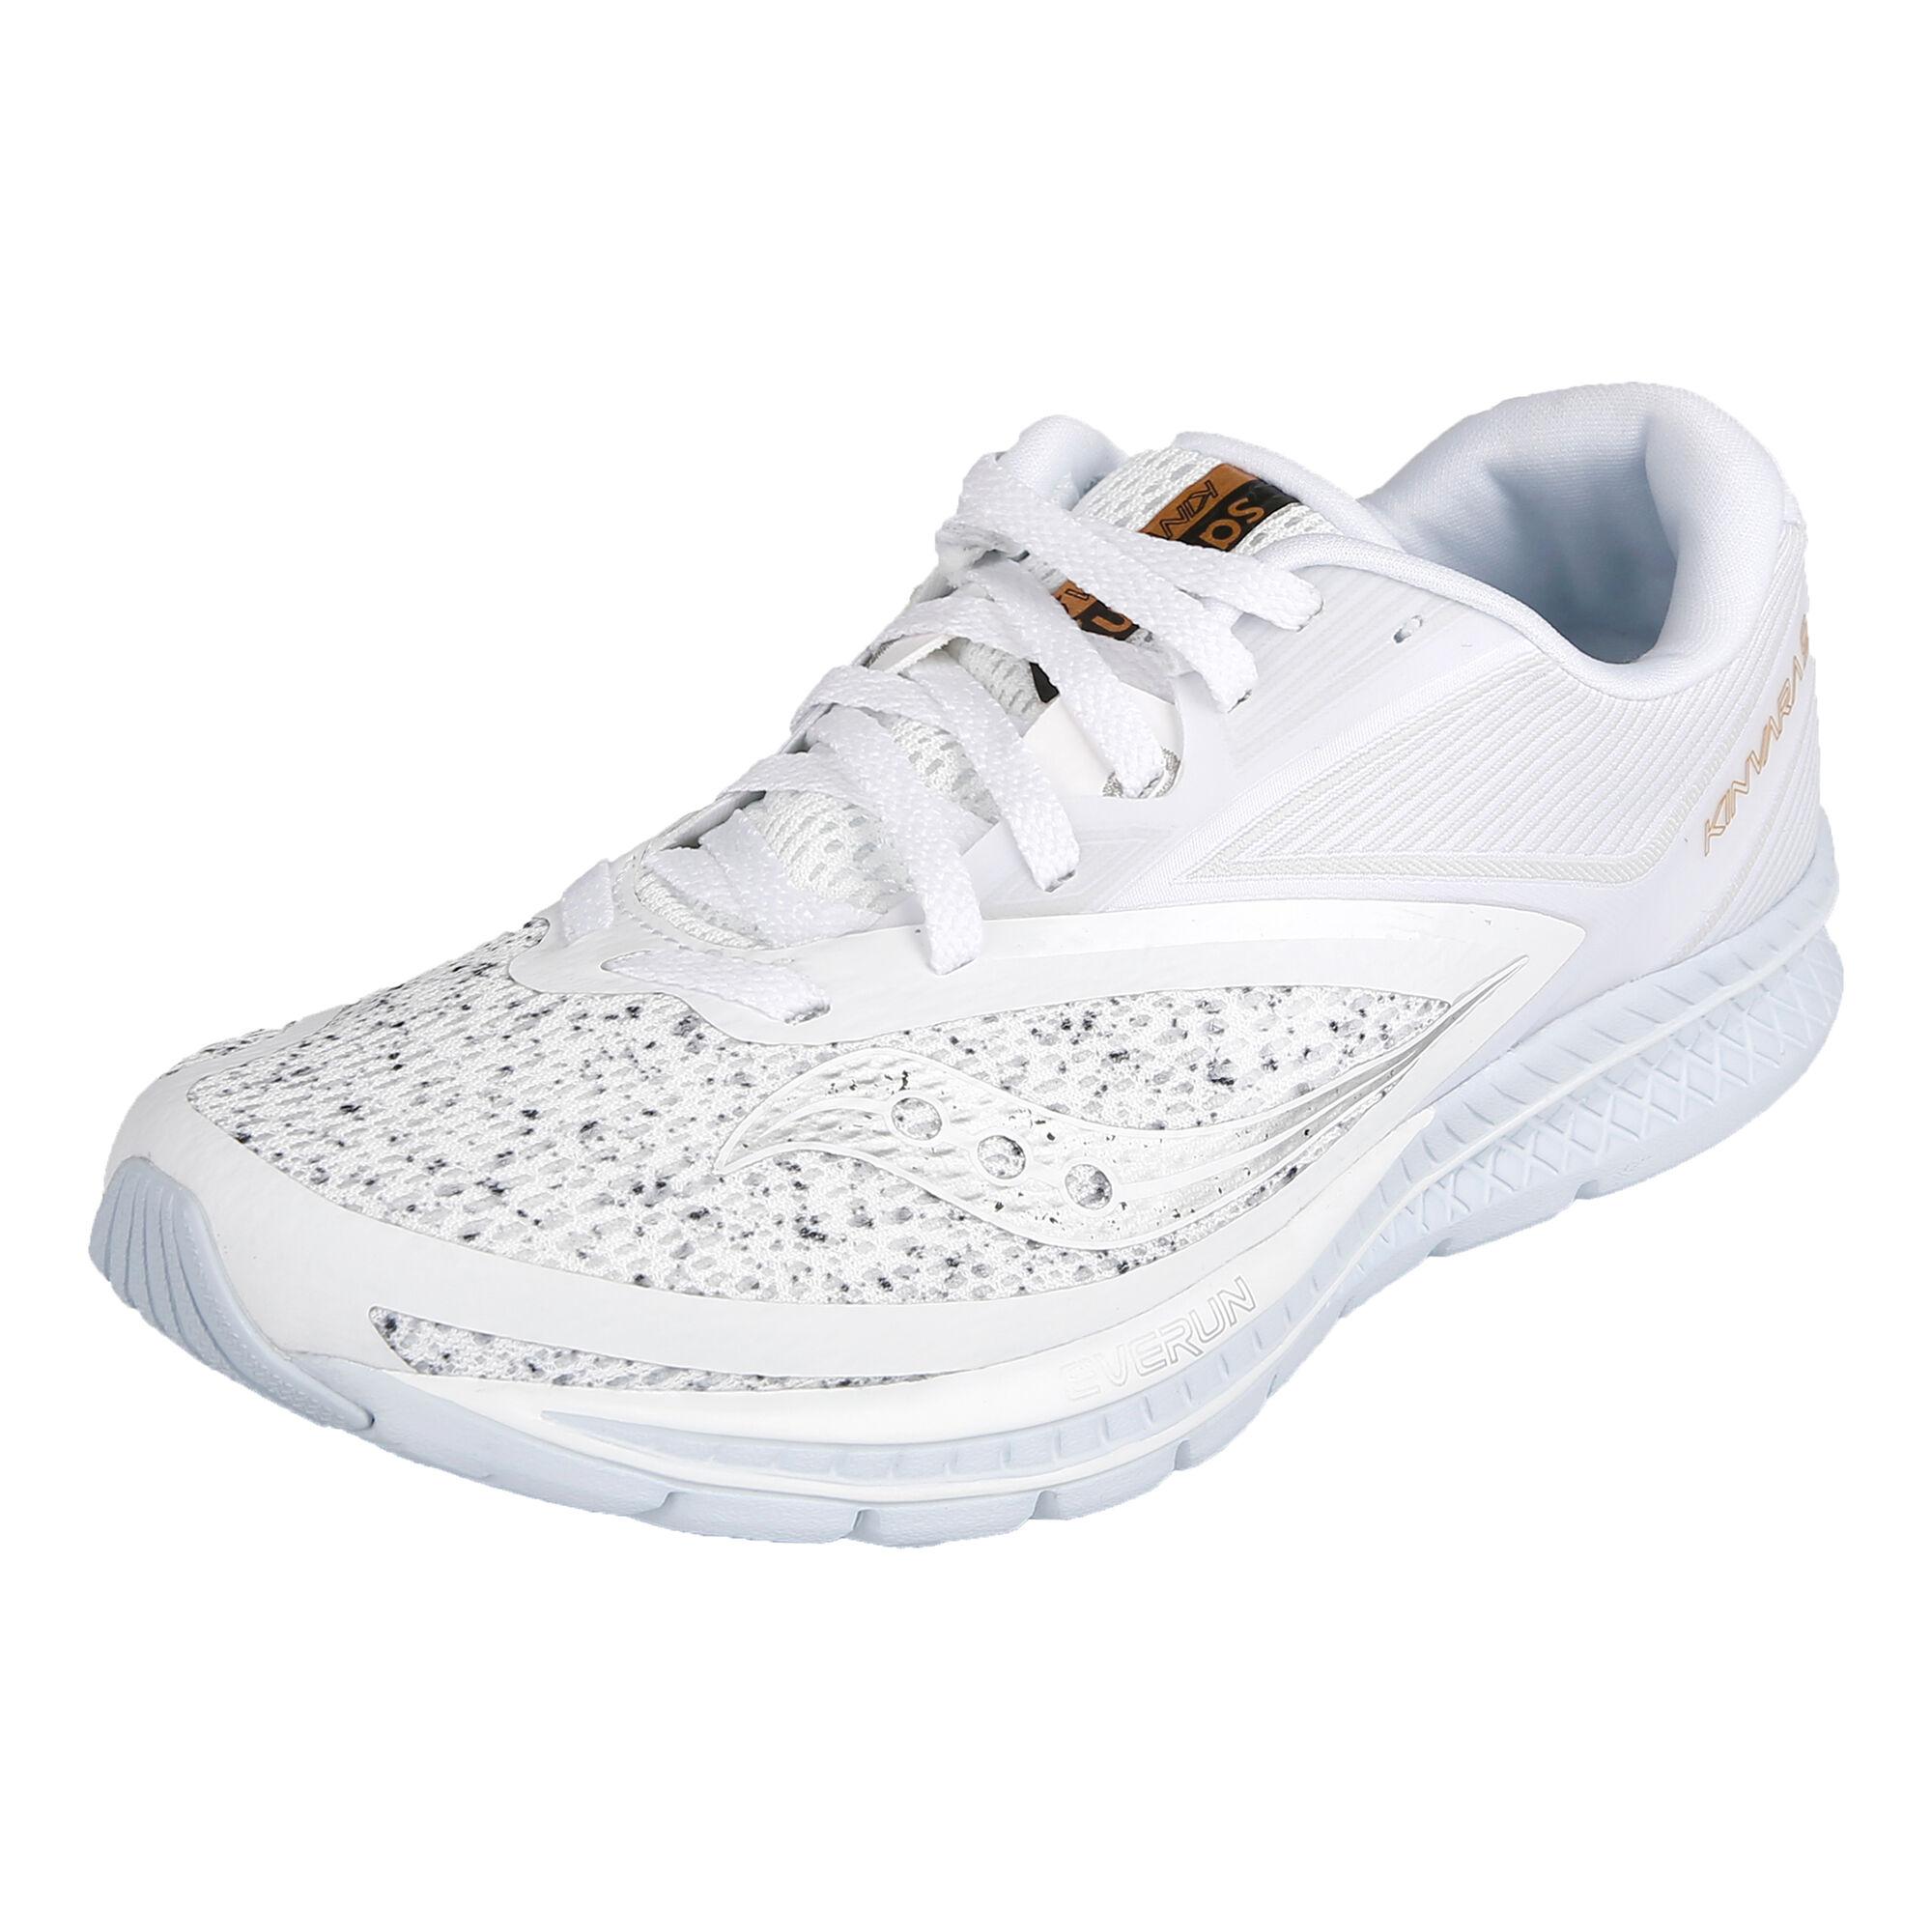 a7570fa6 buy Saucony Kinvara 9 Neutral Running Shoe Women - White, Silver ...